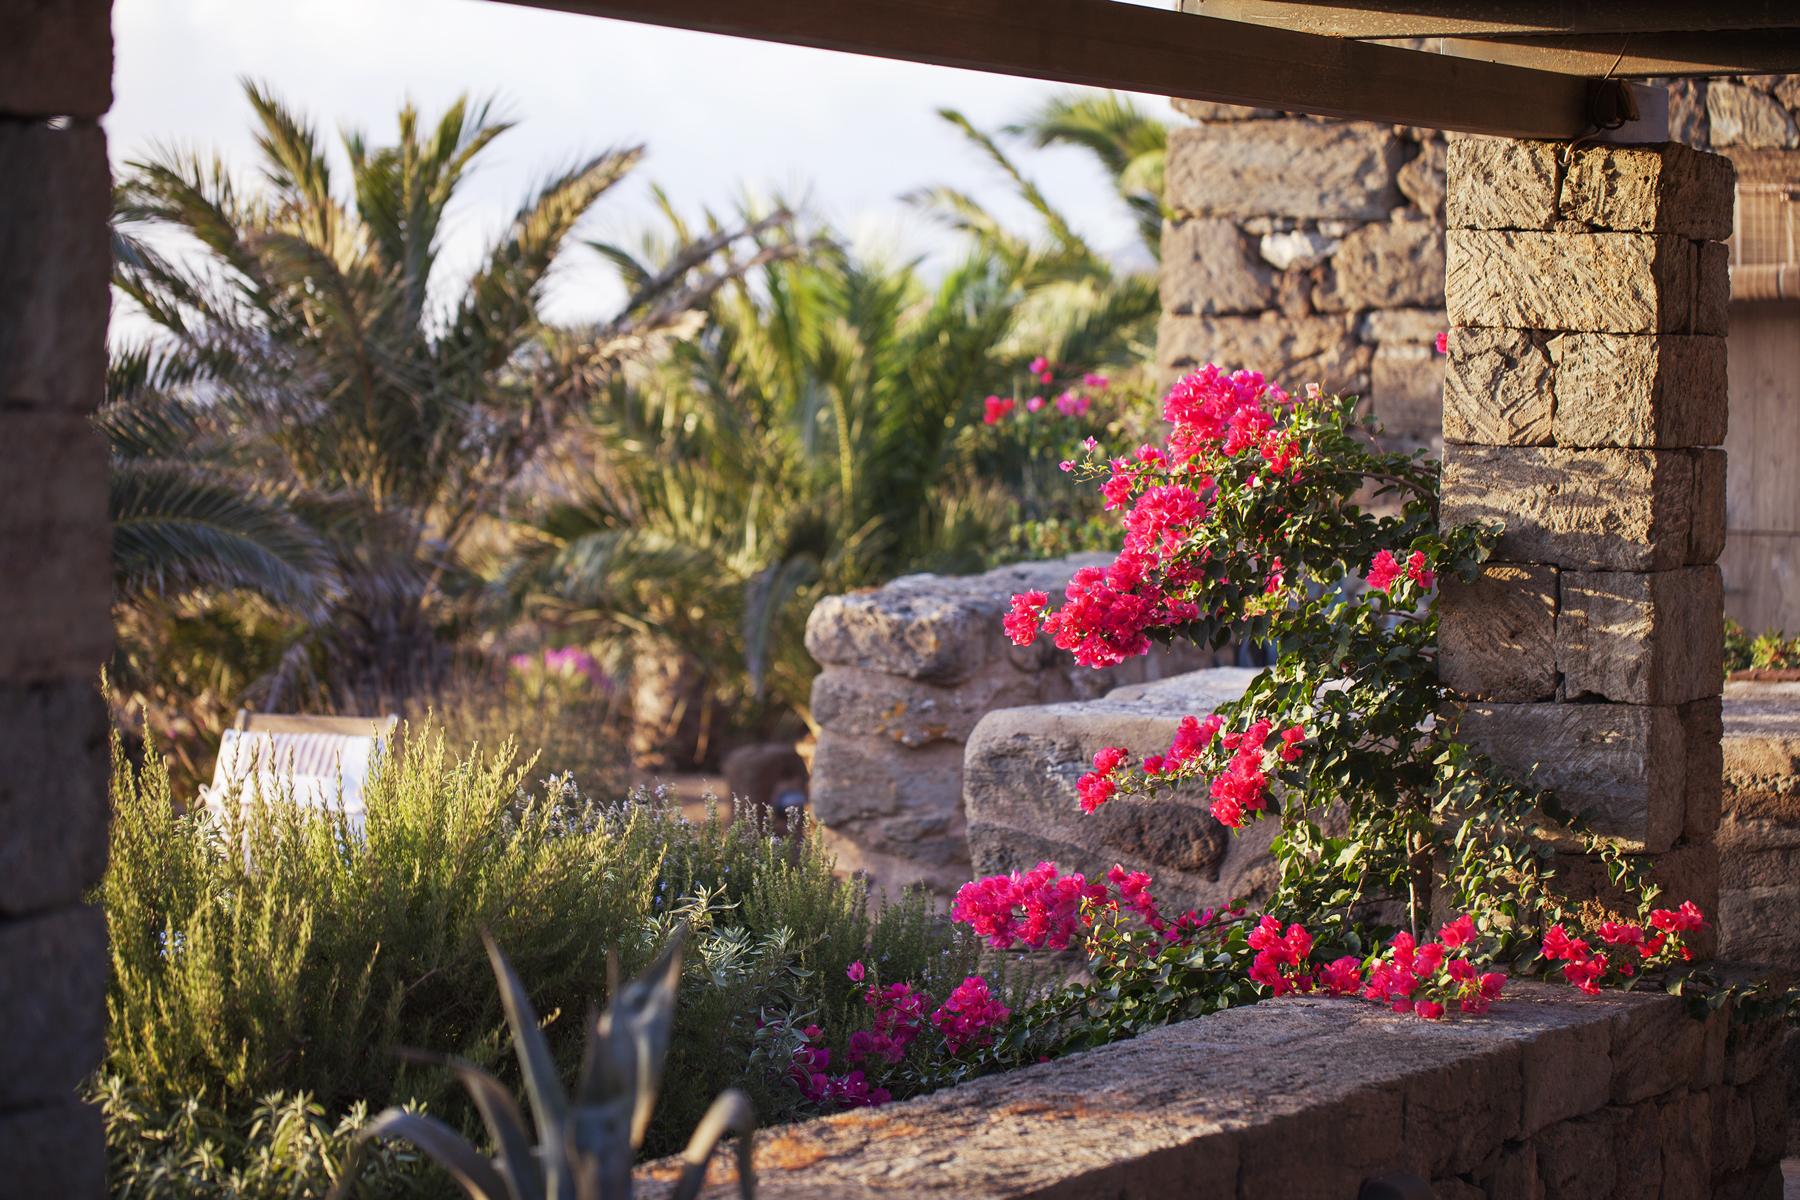 Dammuso vigna 2 people tenuta borgia dammusi pantelleria - Terrazas rusticas ...